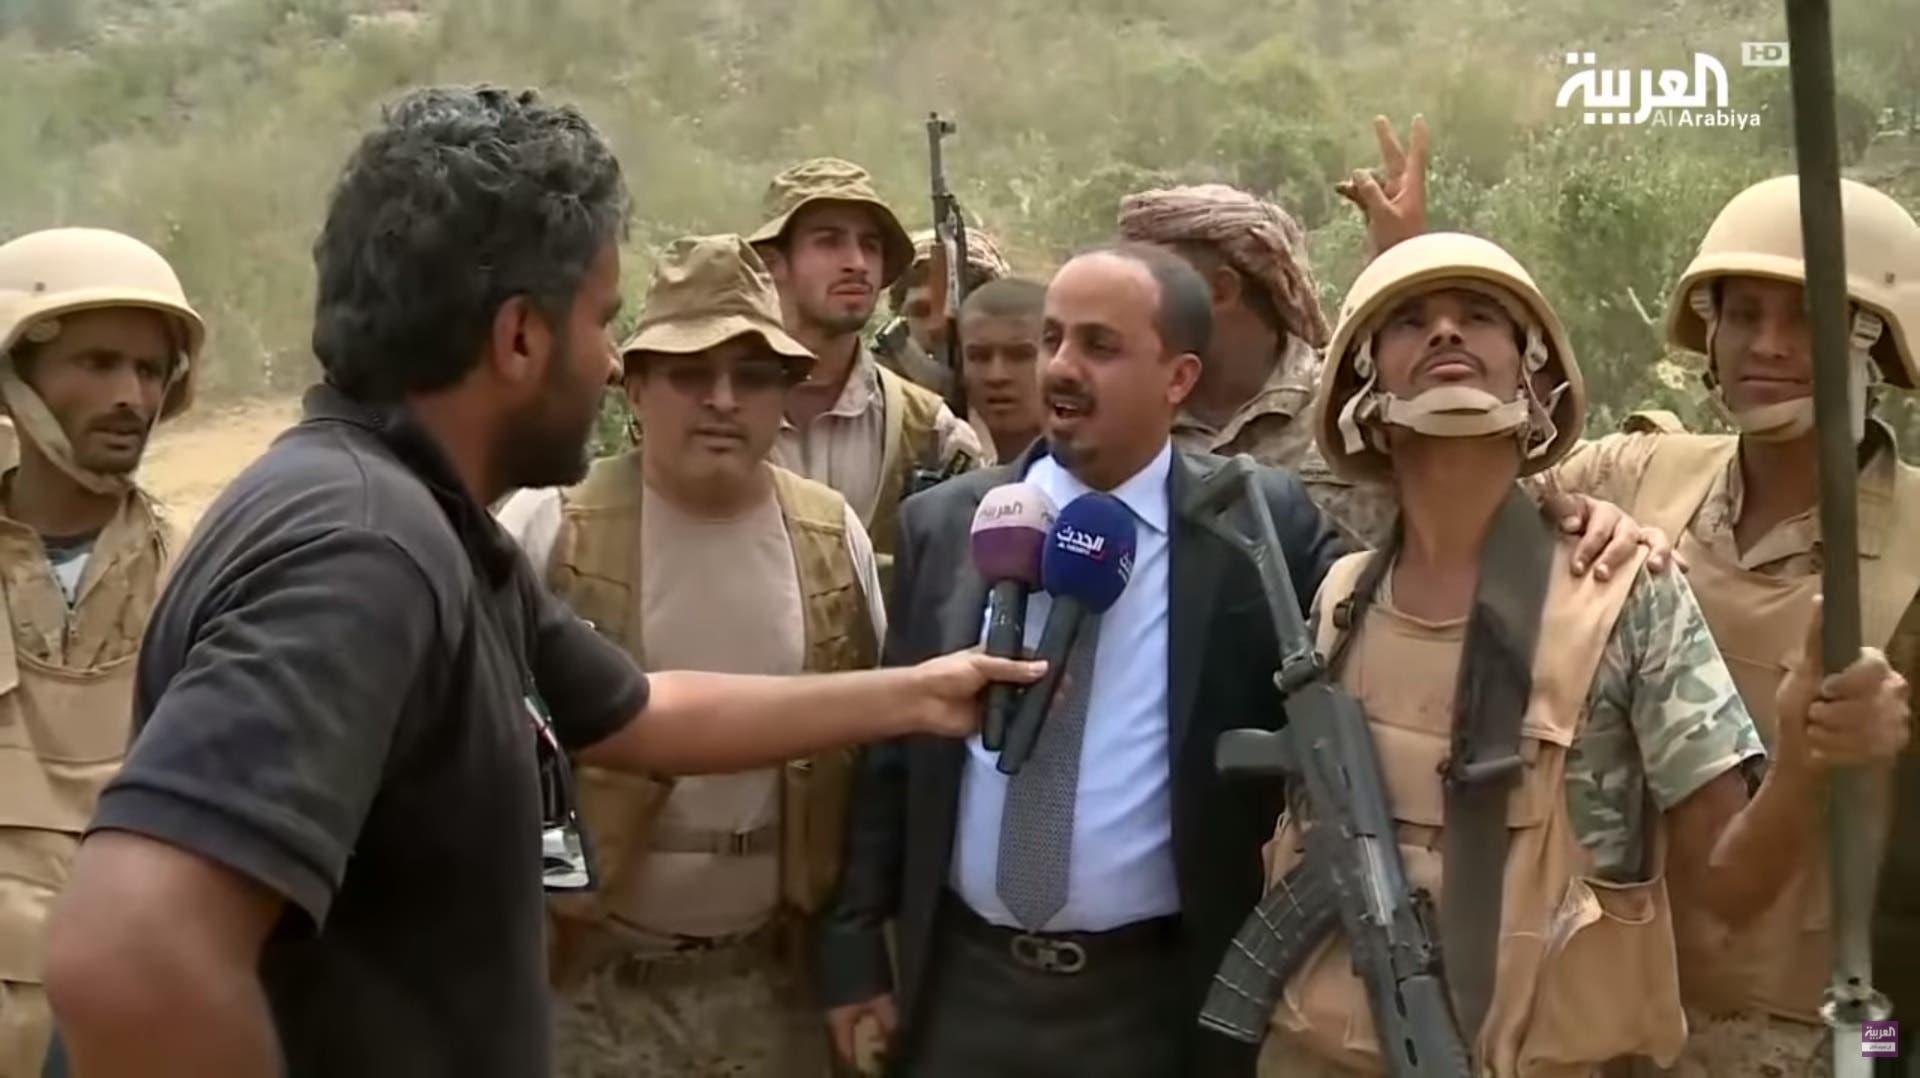 Yemeni information minister Muammar al-Iryani